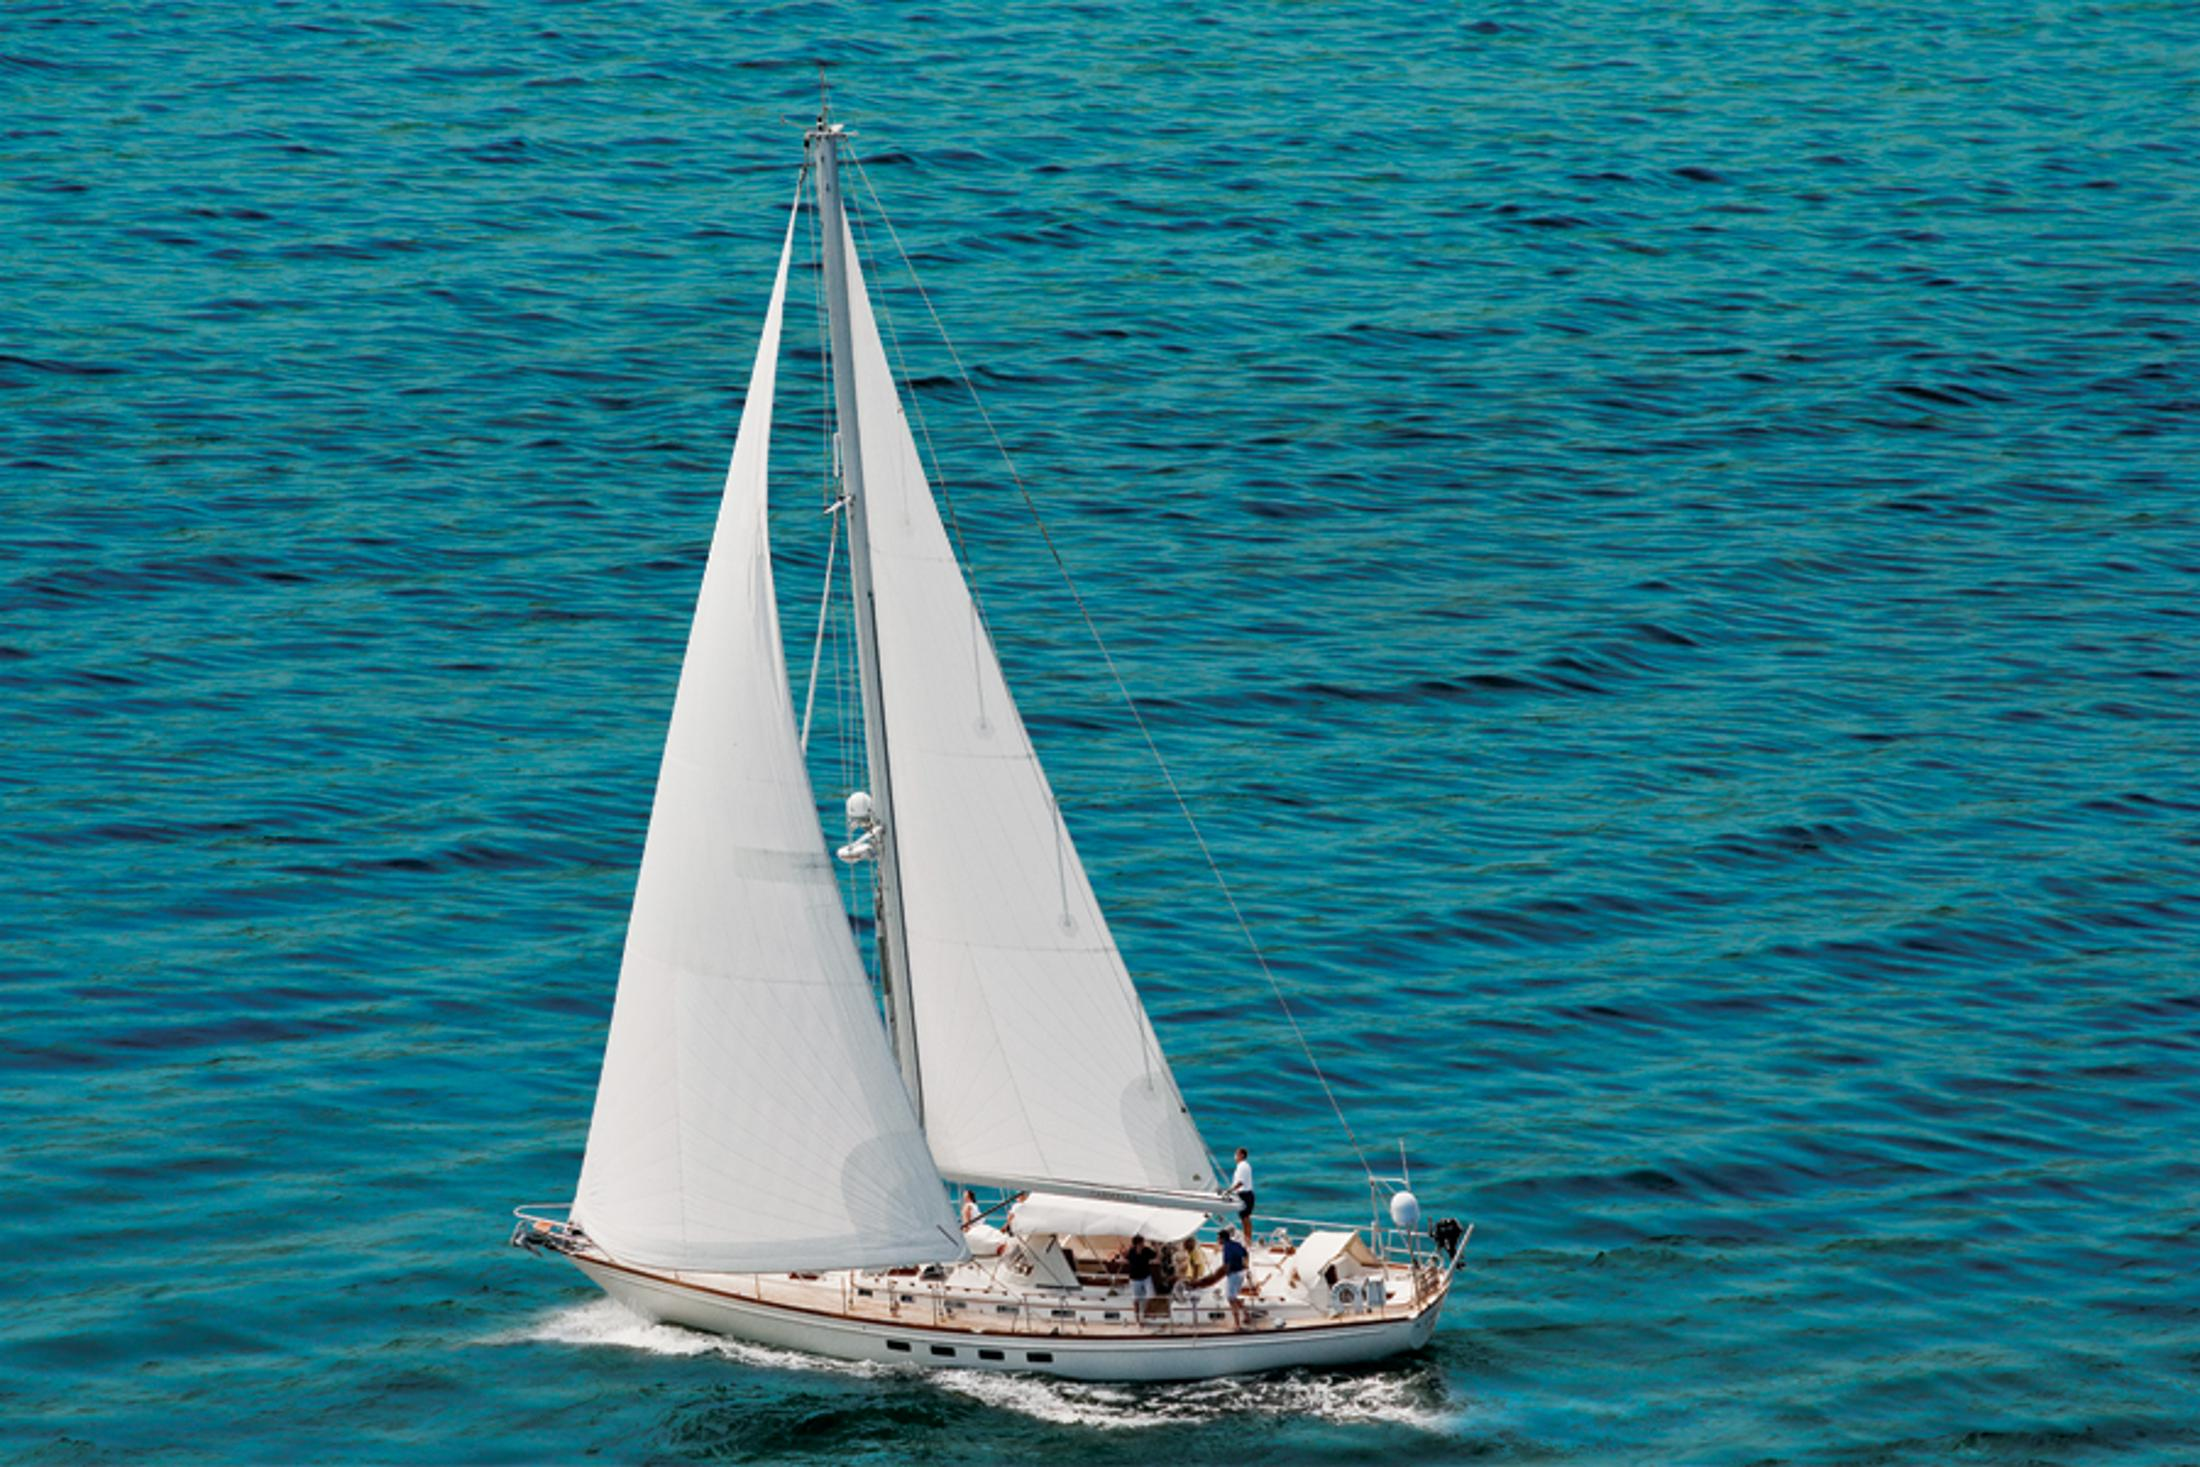 58 little harbor 1989 carmella palm beach florida